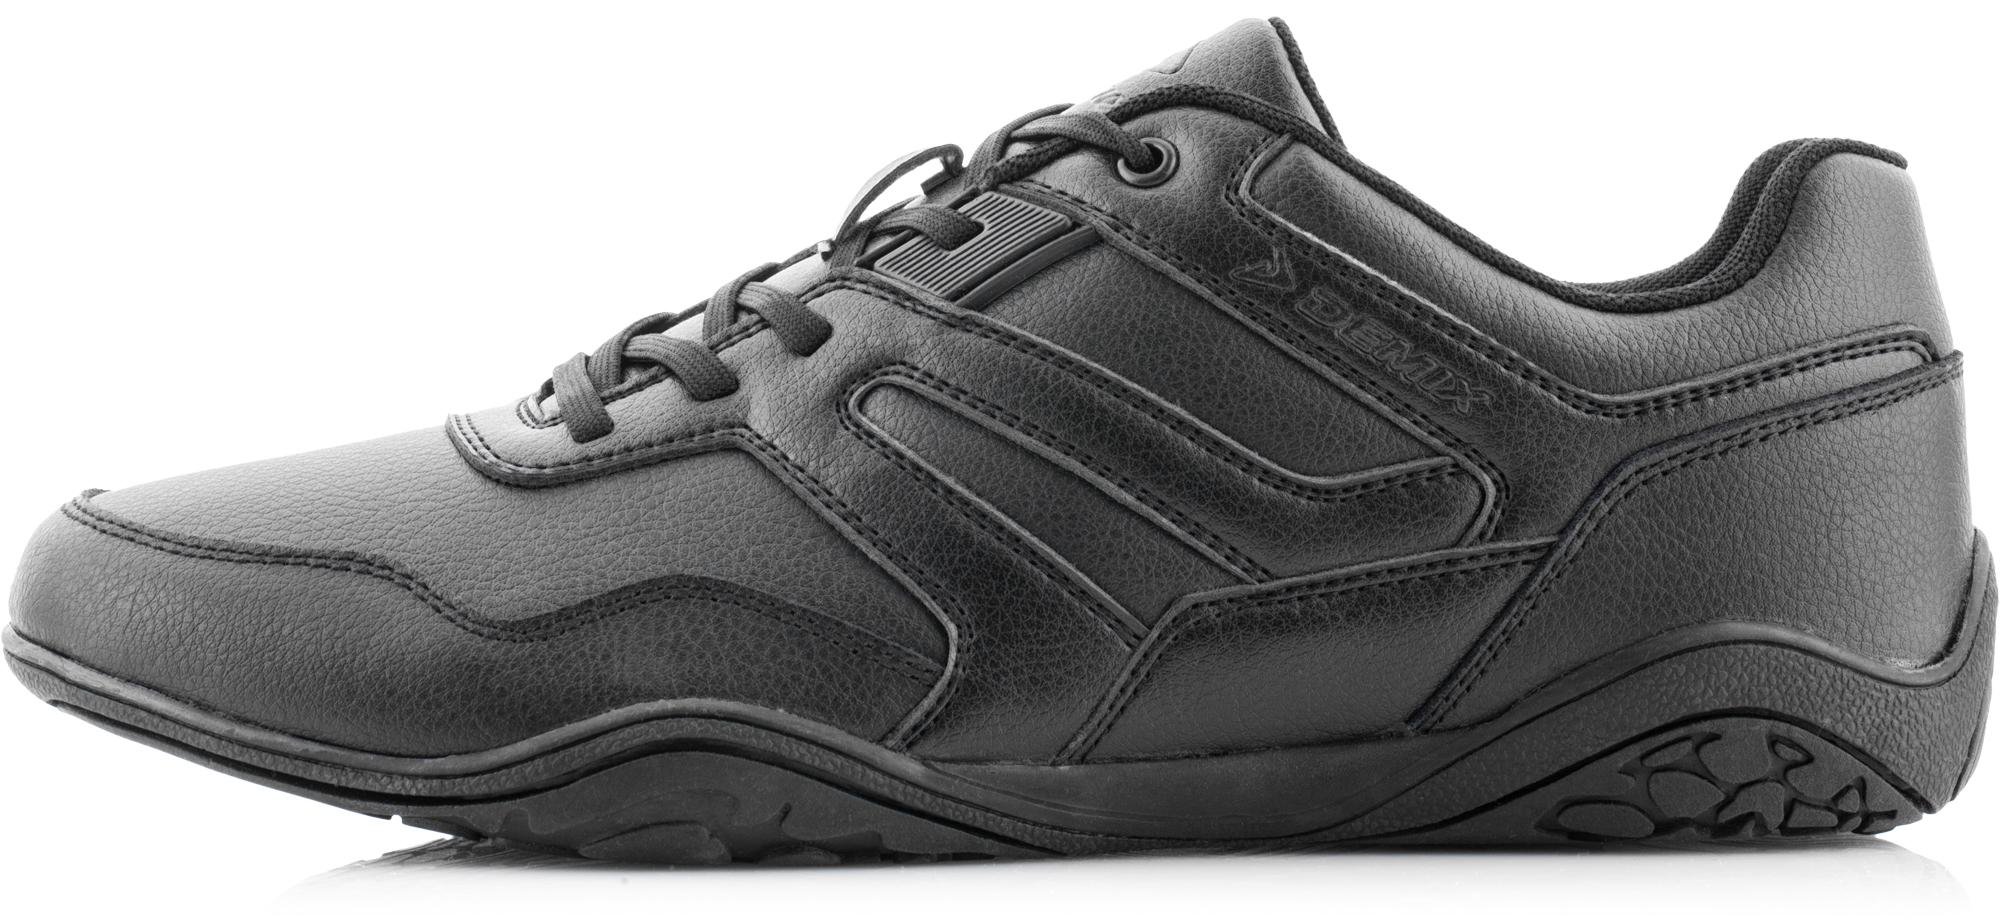 Demix Кроссовки мужские Demix Walk брюки спортивного стиля мужские